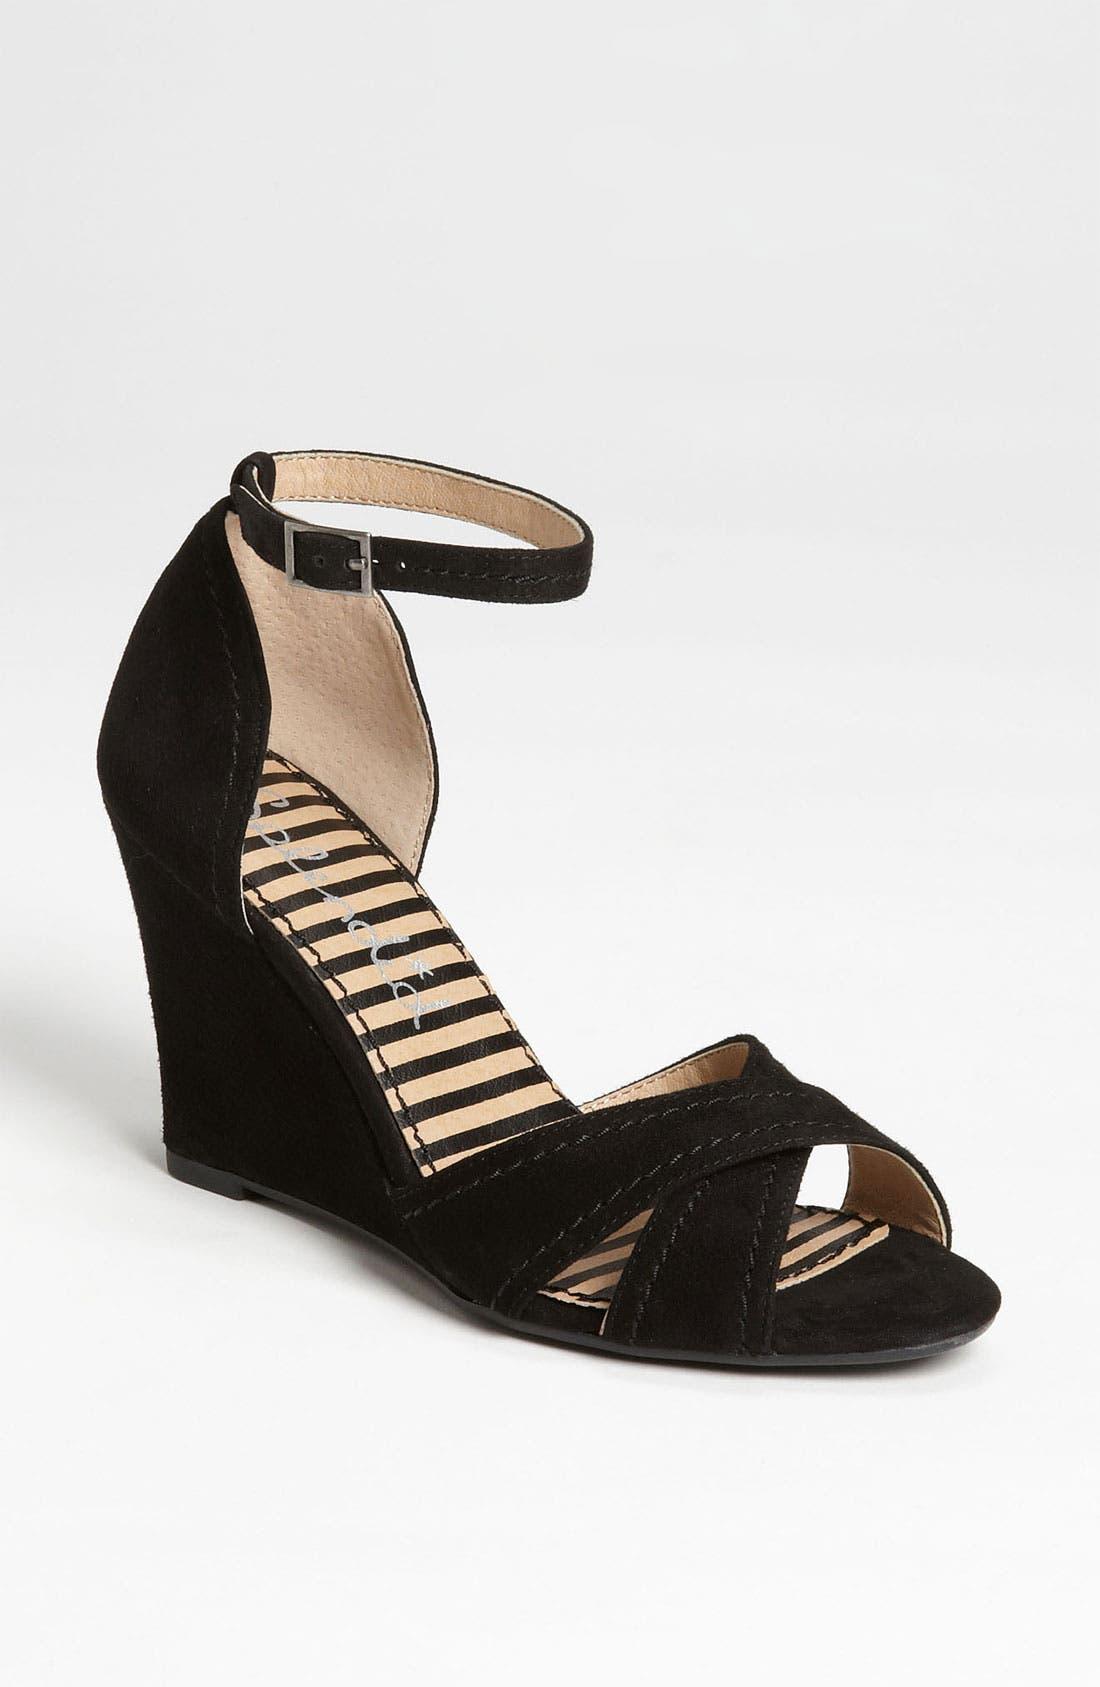 Alternate Image 1 Selected - Splendid 'Dallas' Sandal